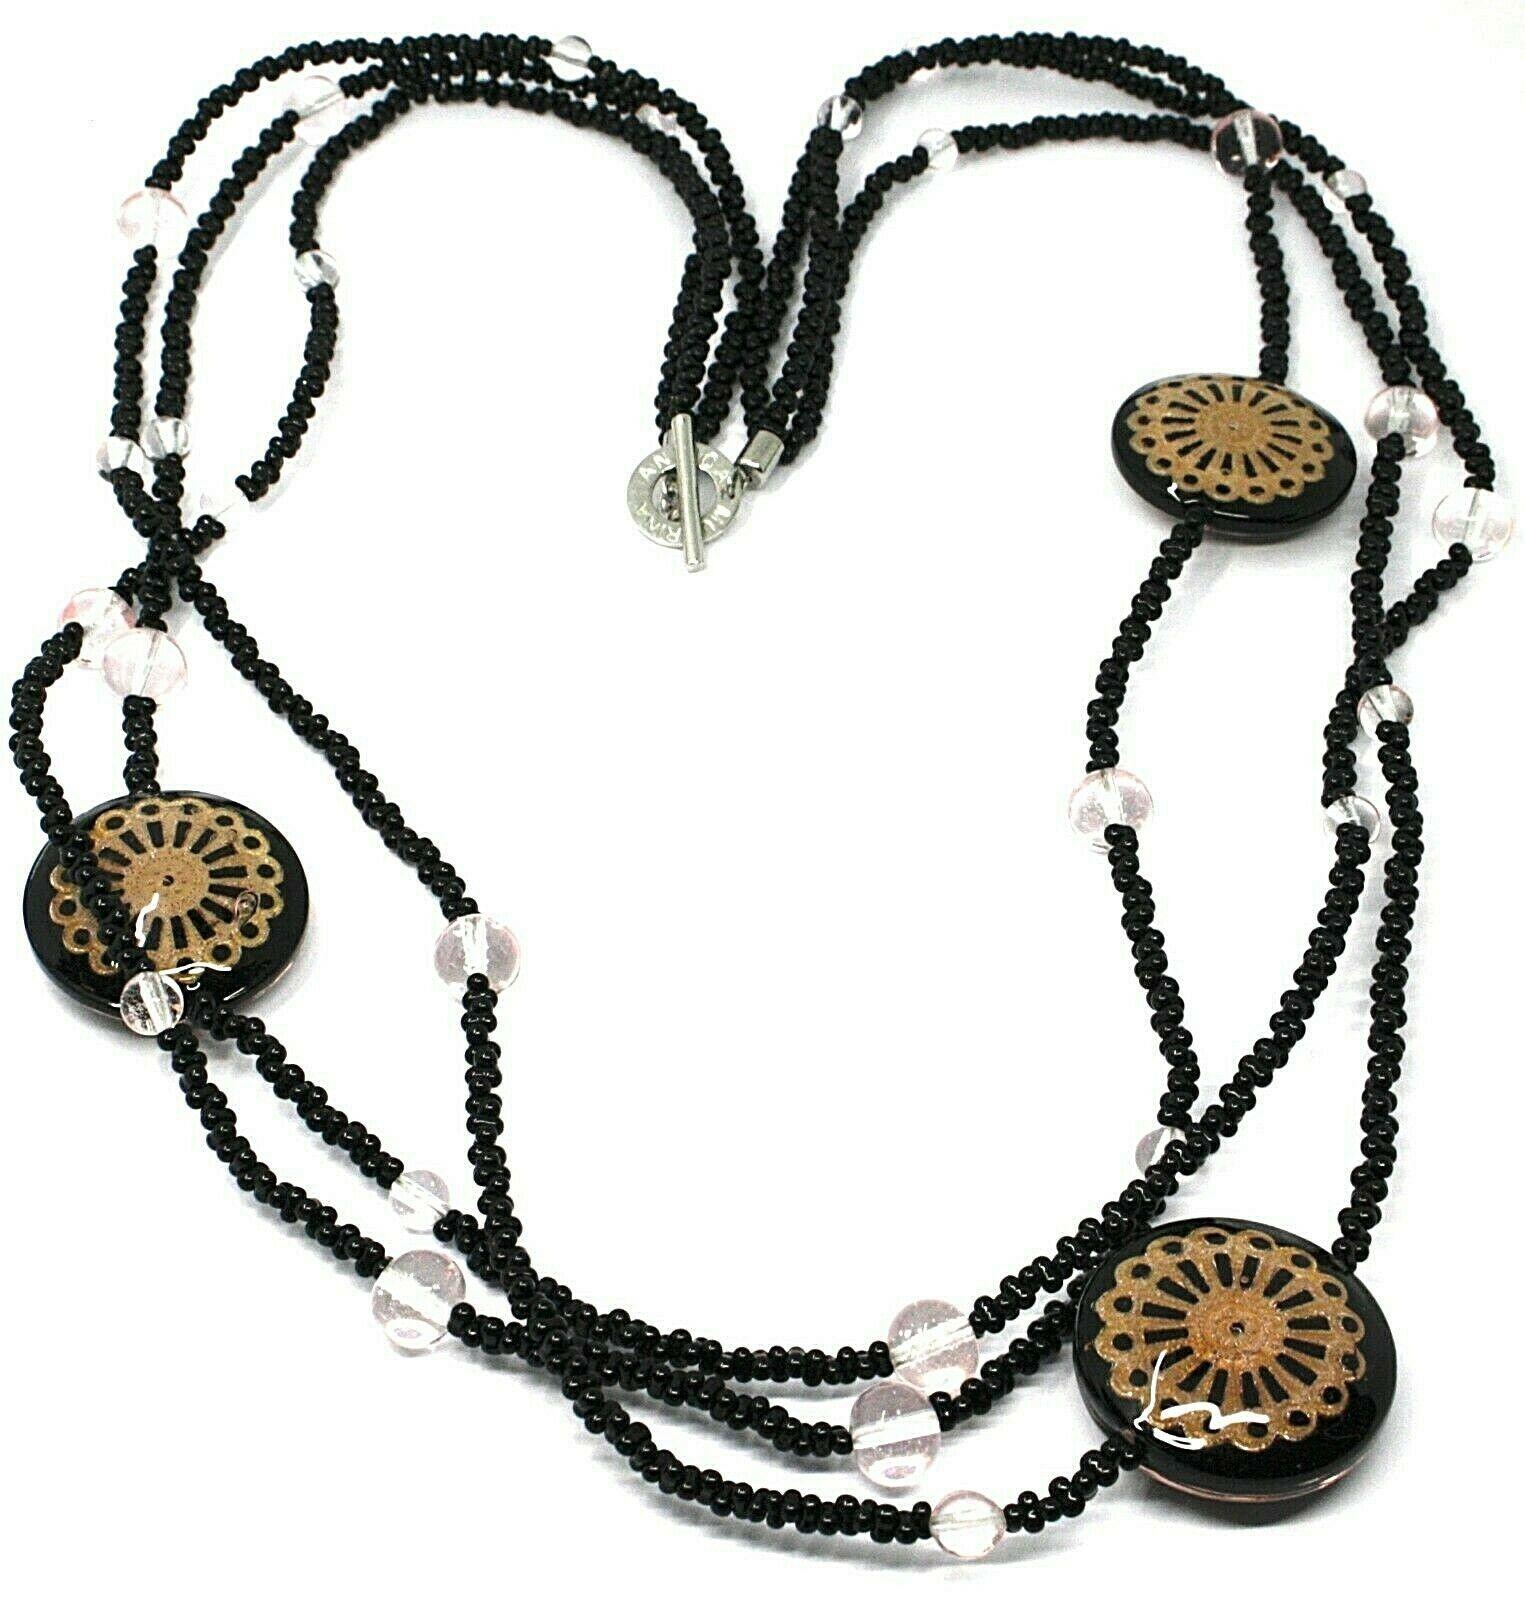 Necklace Antica Murrina Venezia, 3 Wires, Discs with Flowers, Black, CO724A14